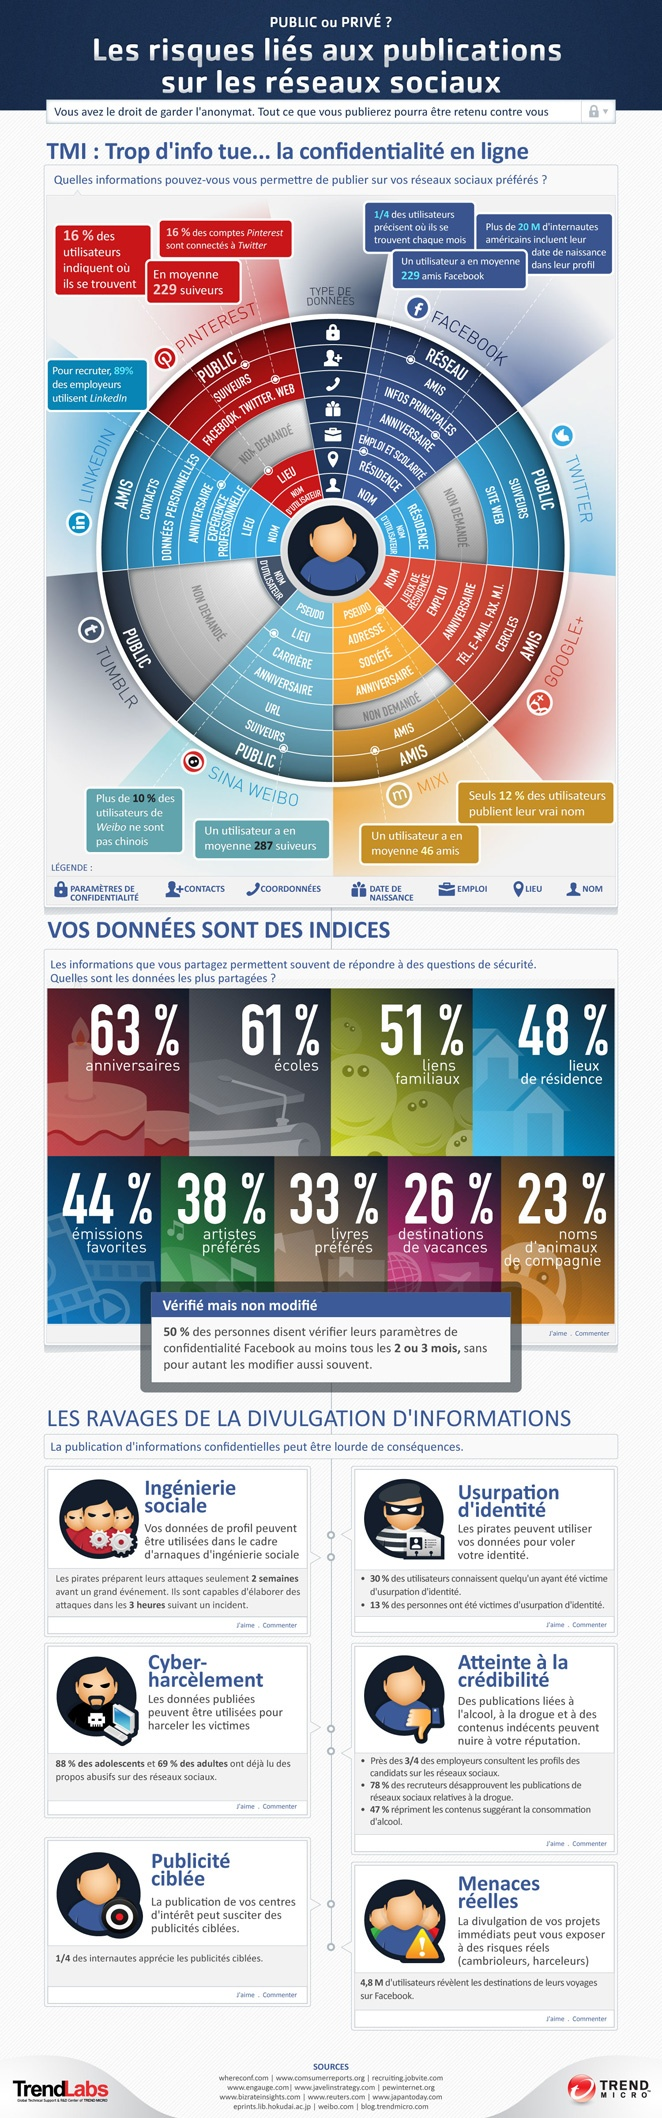 infographic-risk-of-posting-in-social-networks-fr